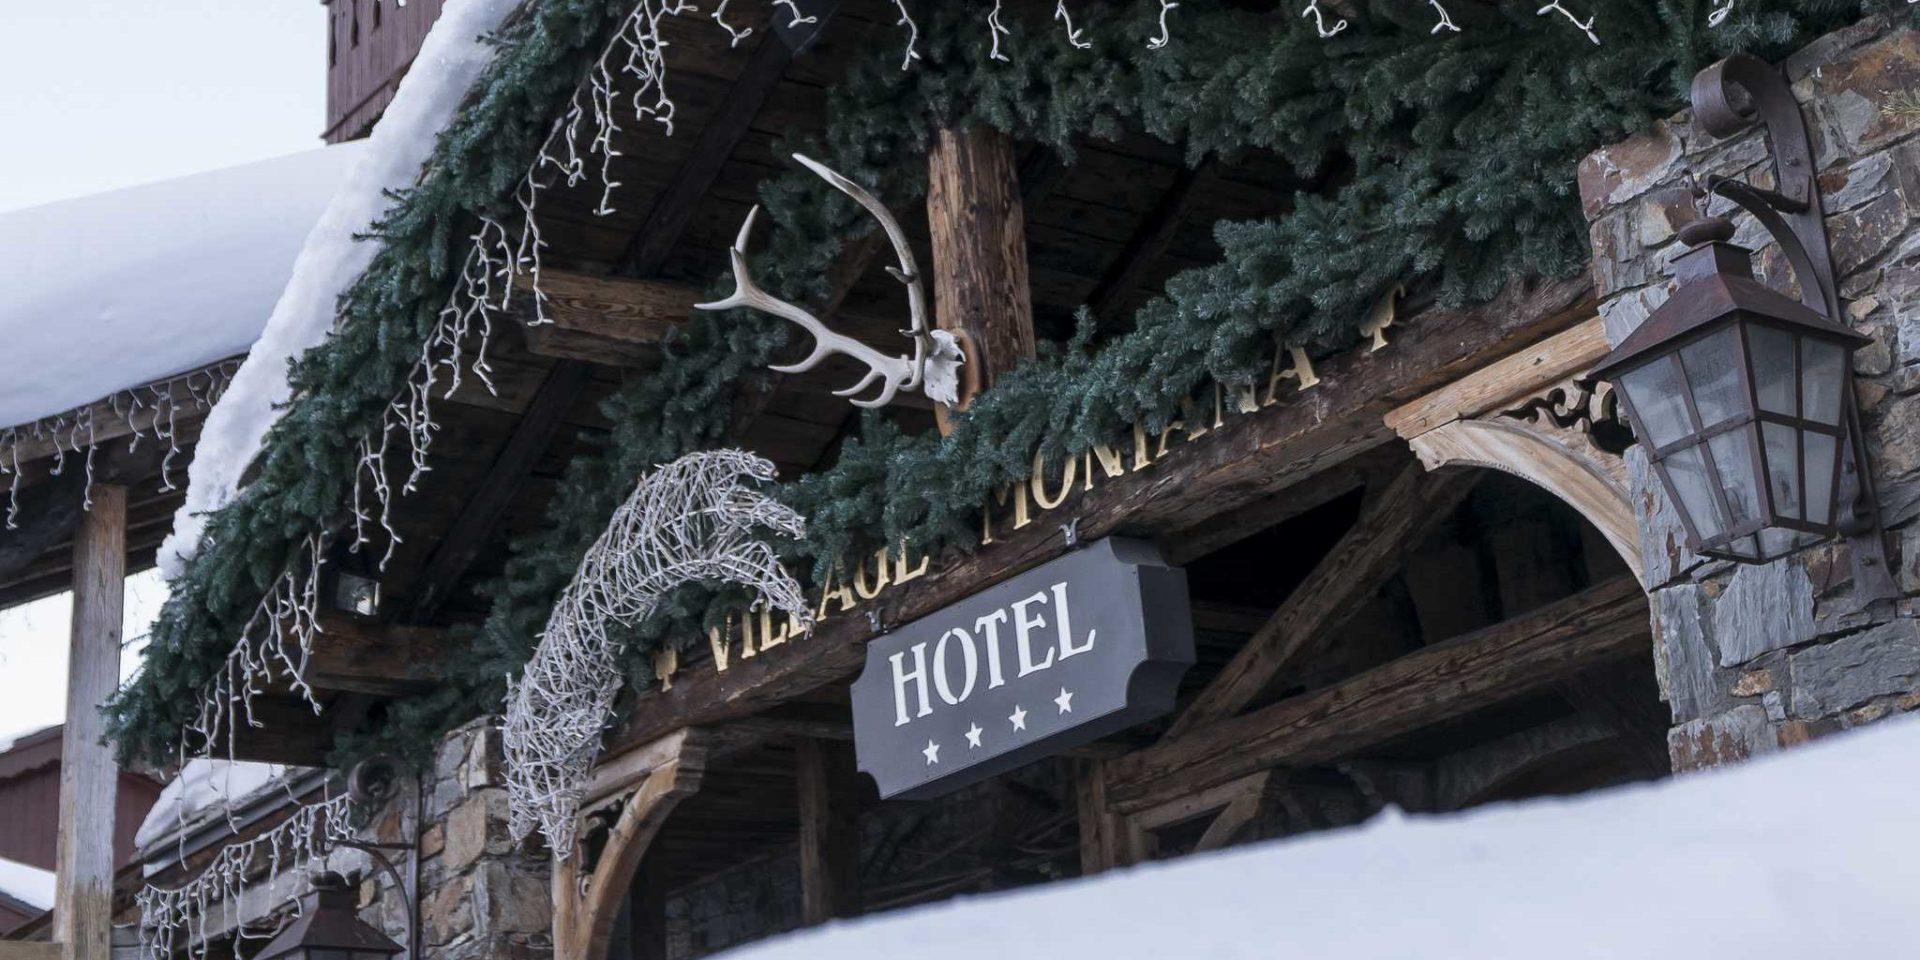 Hotel Village Montana Tignes Tignes-Val d'Isere Frankrijk wintersport skivakantie luxe entree Hotel 4 sterren Village Montana gewei dennentakken sneeuw